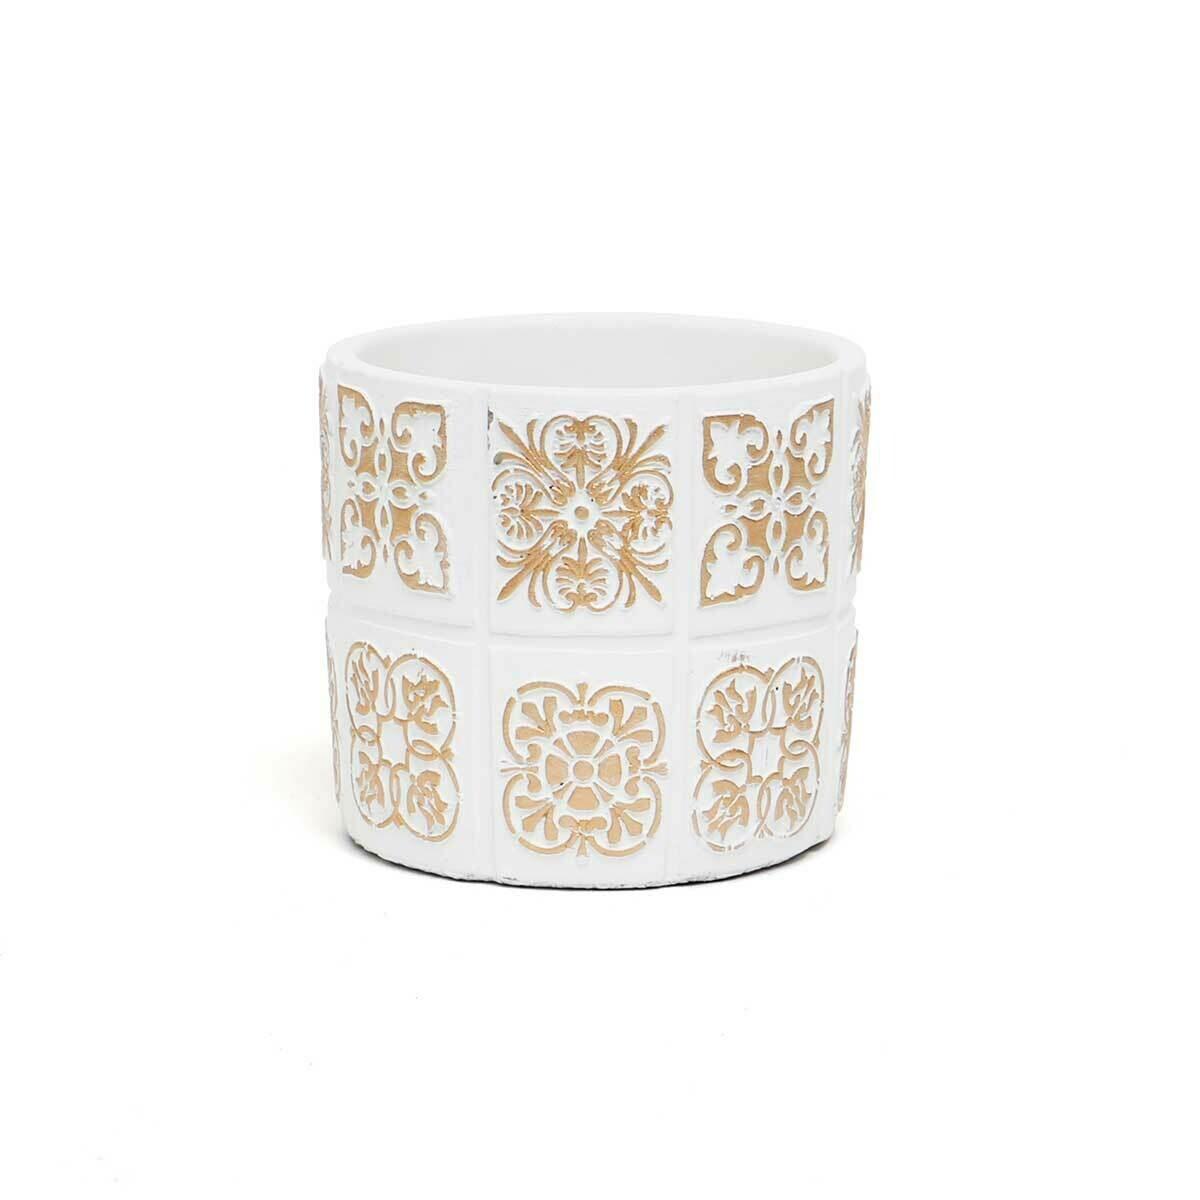 "Medallion Concrete Pot - White & Beige - Small  - 4.5""H x 4.25""W"